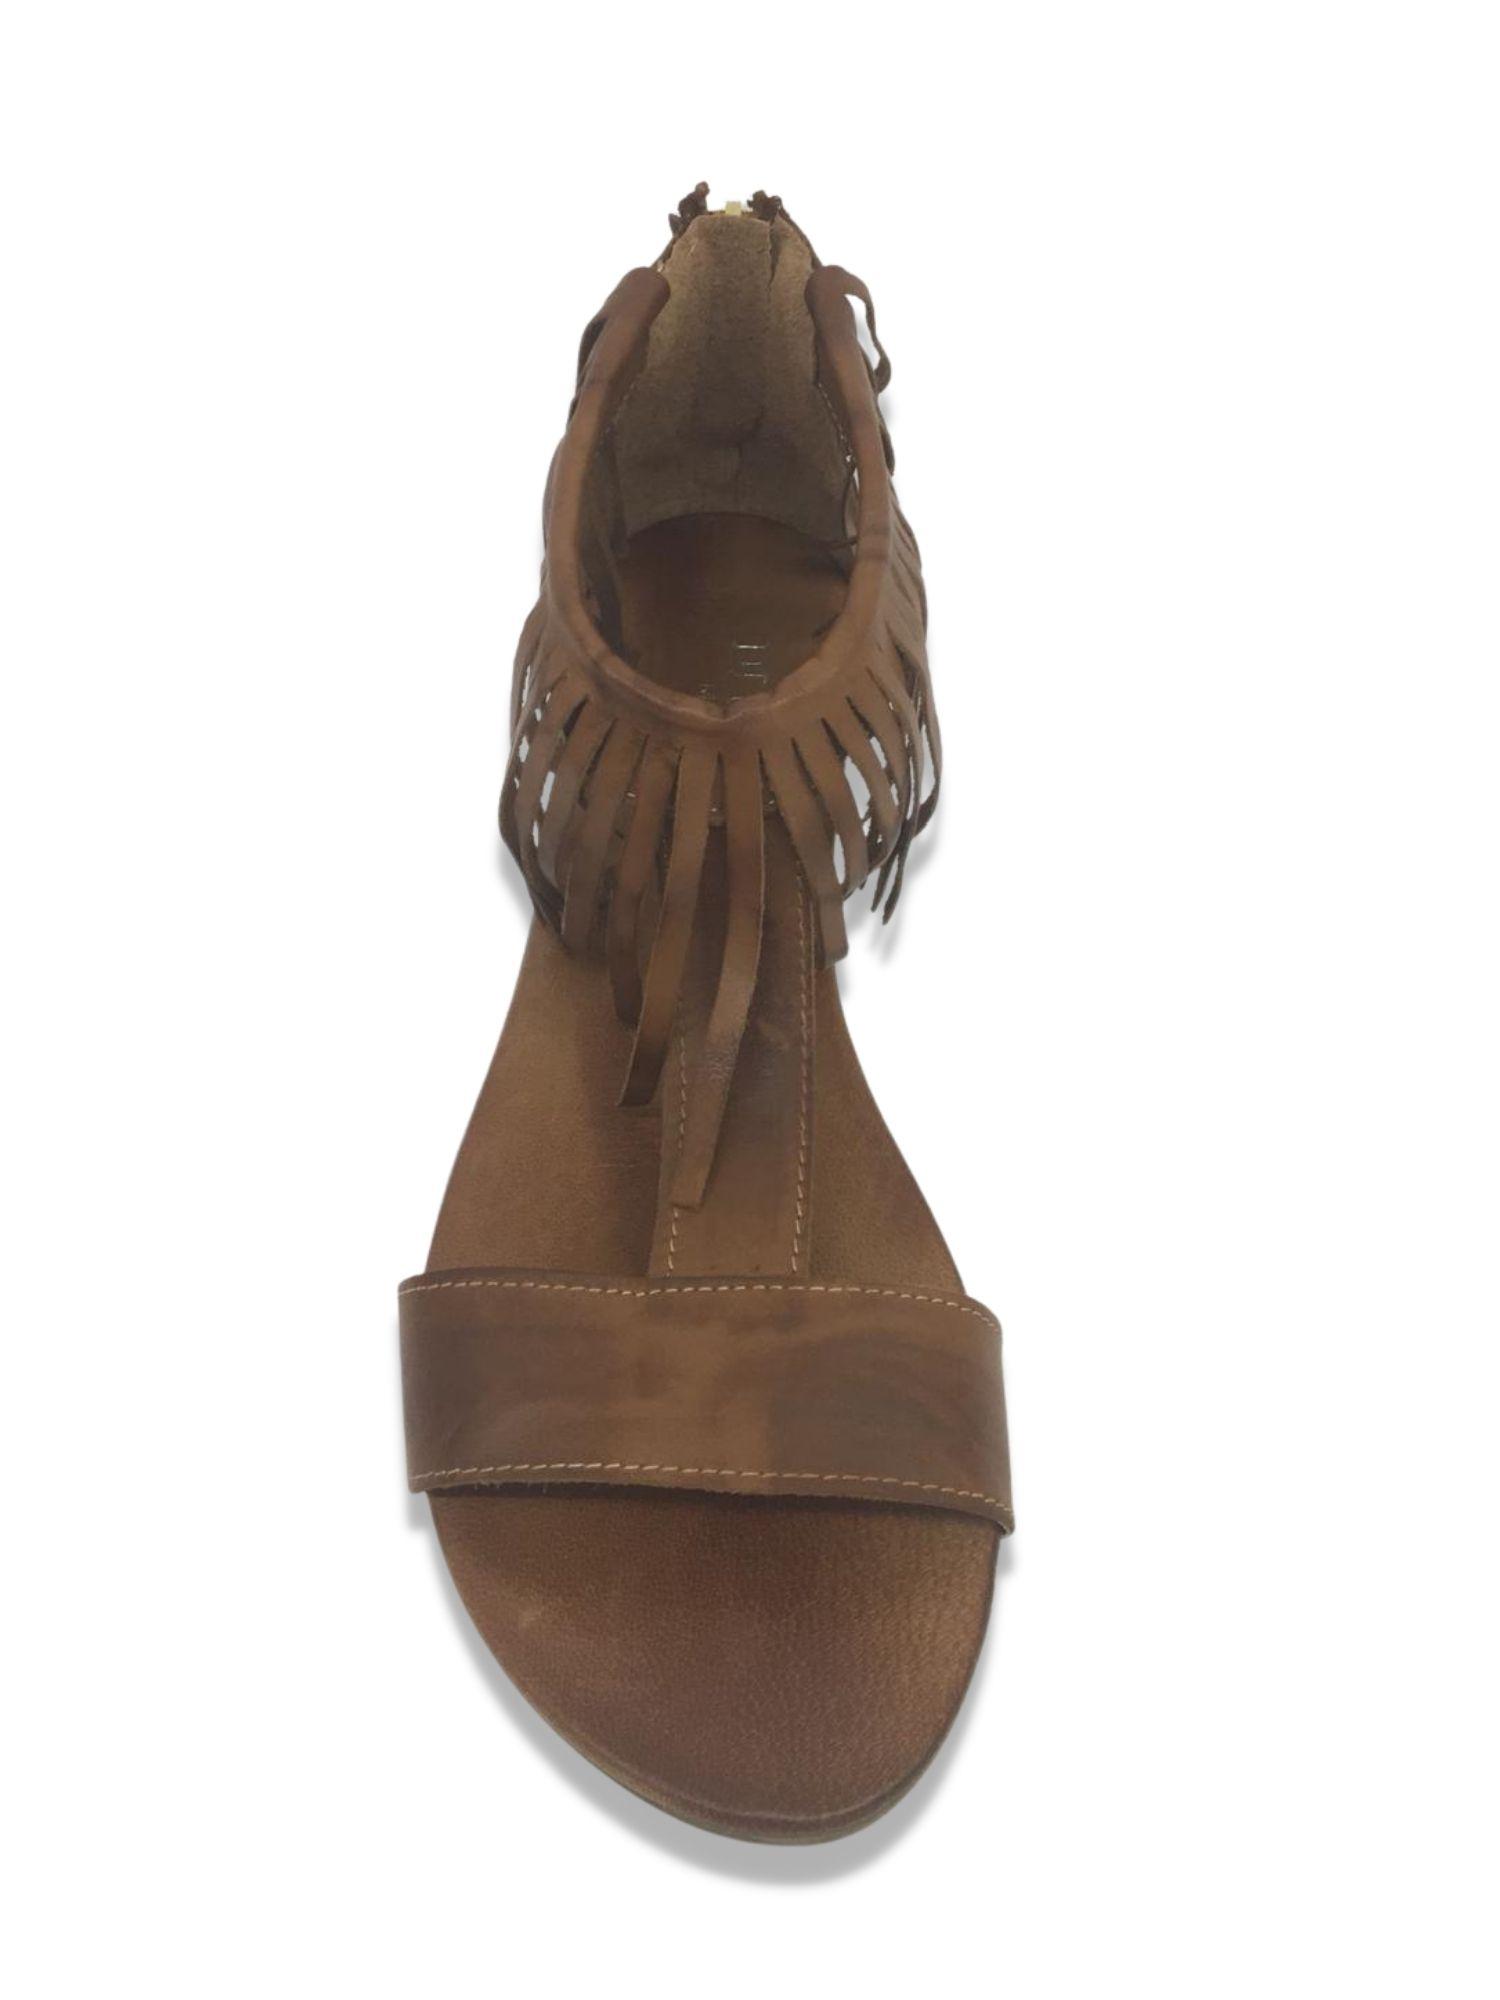 Sandalo infradito Made in Italy 215 cuoio 1